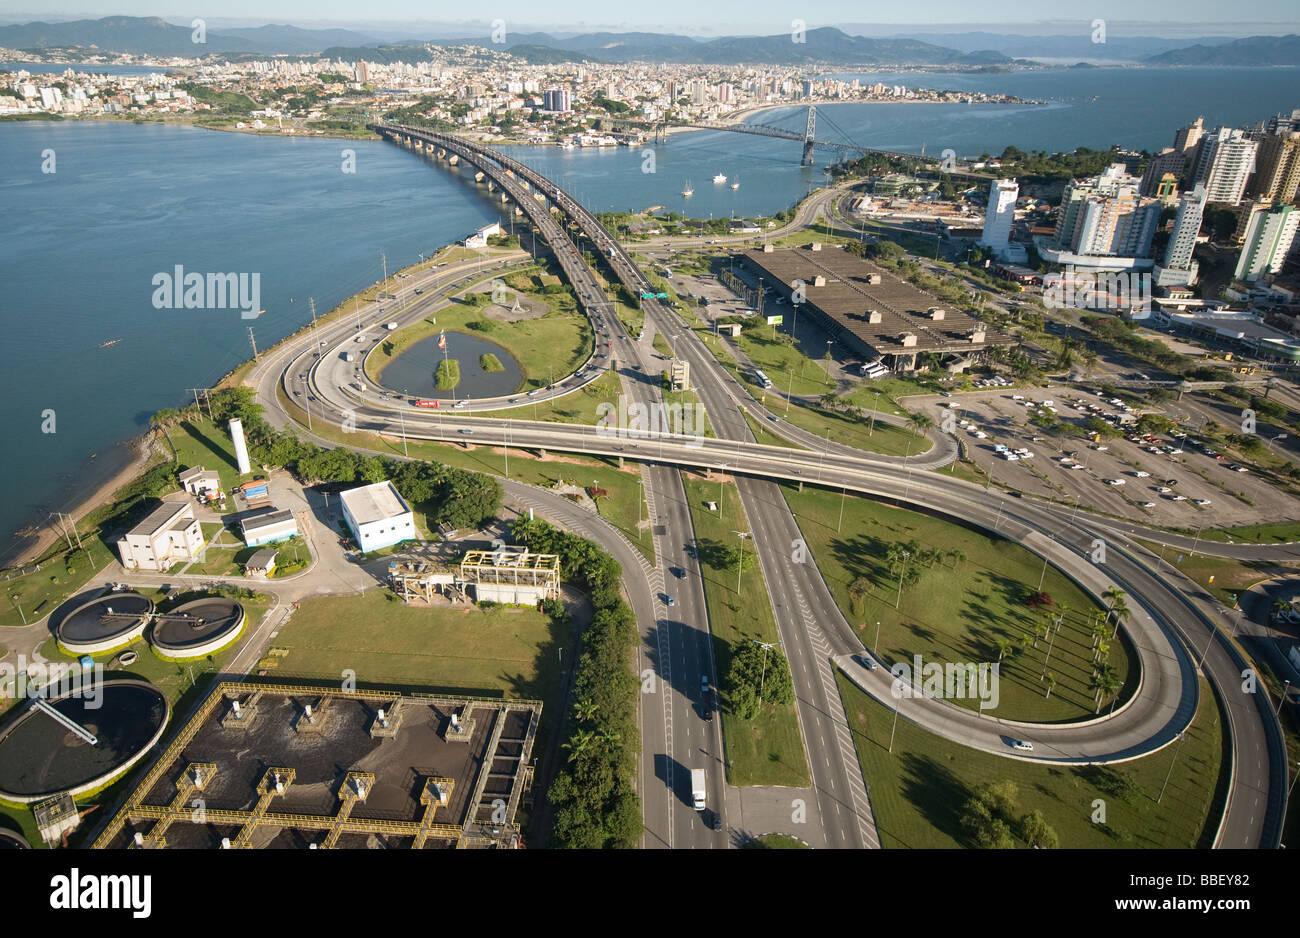 Florianopolis aerial view - Stock Image